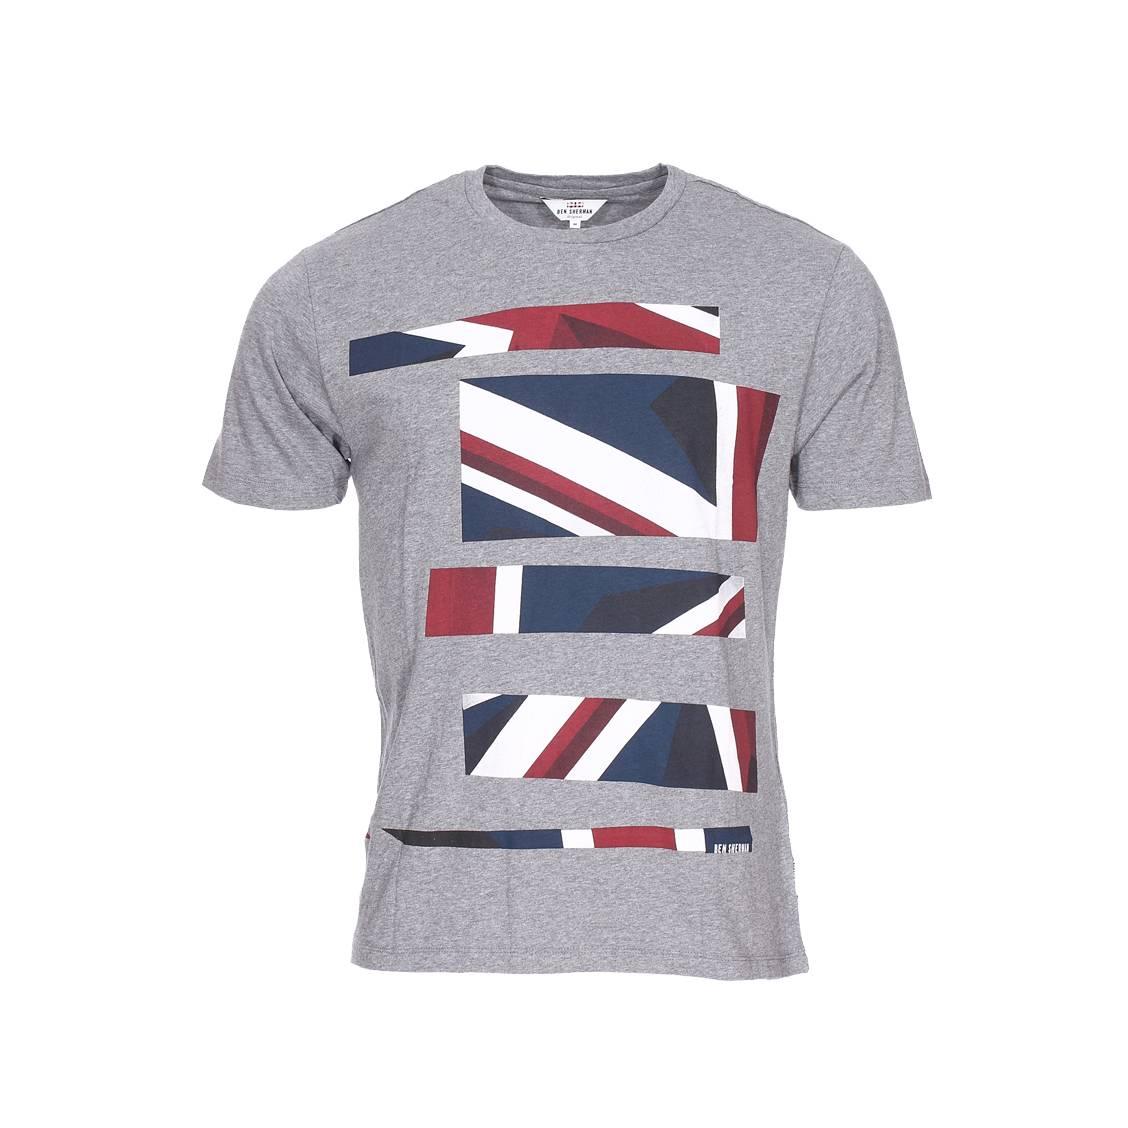 Tee-shirt col rond  gris chiné floqué